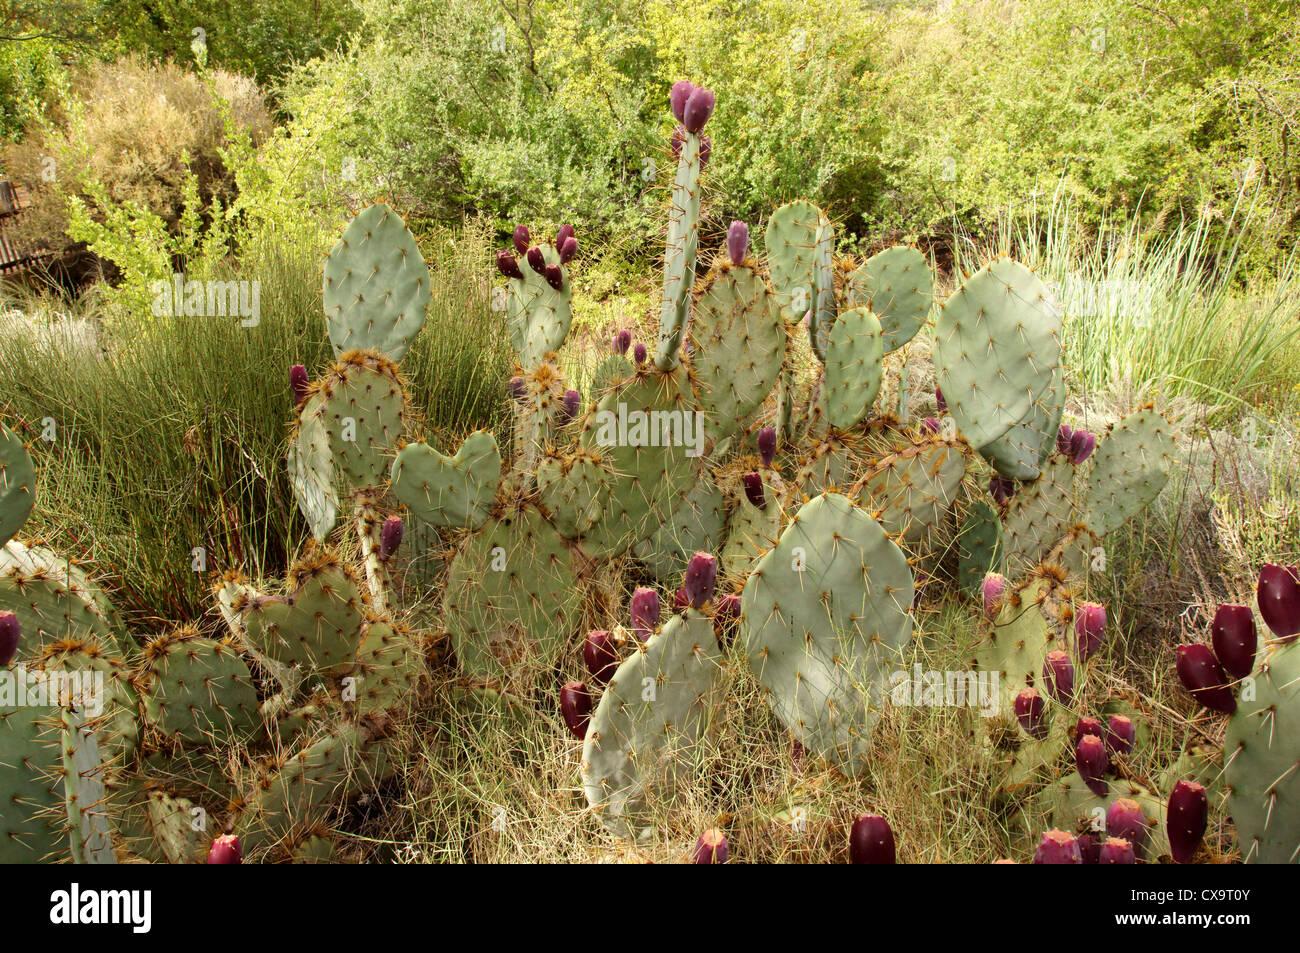 field of birds foot prickly pear cactus pricklypear opunita microcarpa cactaceae botanical garden gardens - Stock Image